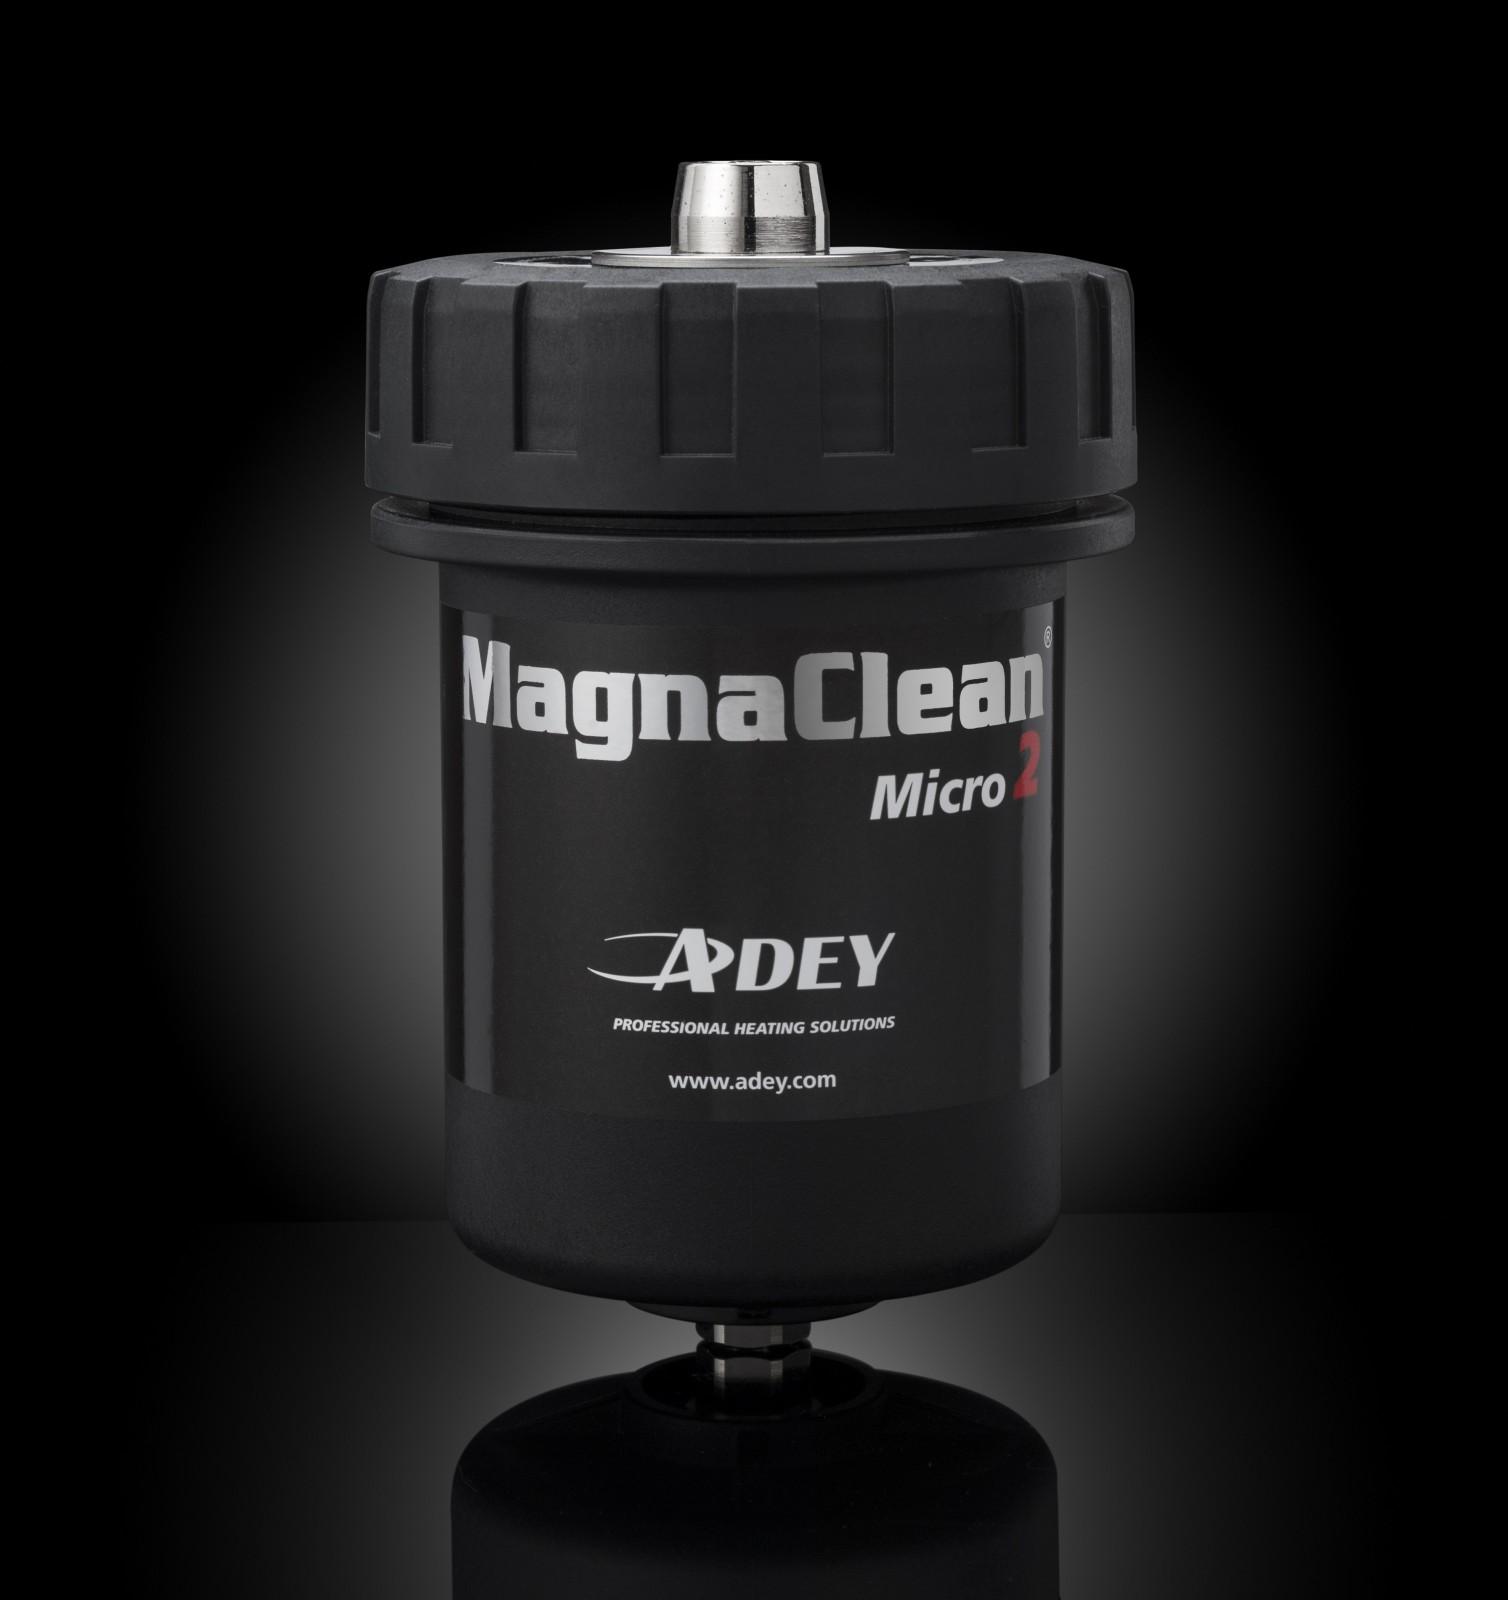 Adey Magnaclean Micro 2 22mm